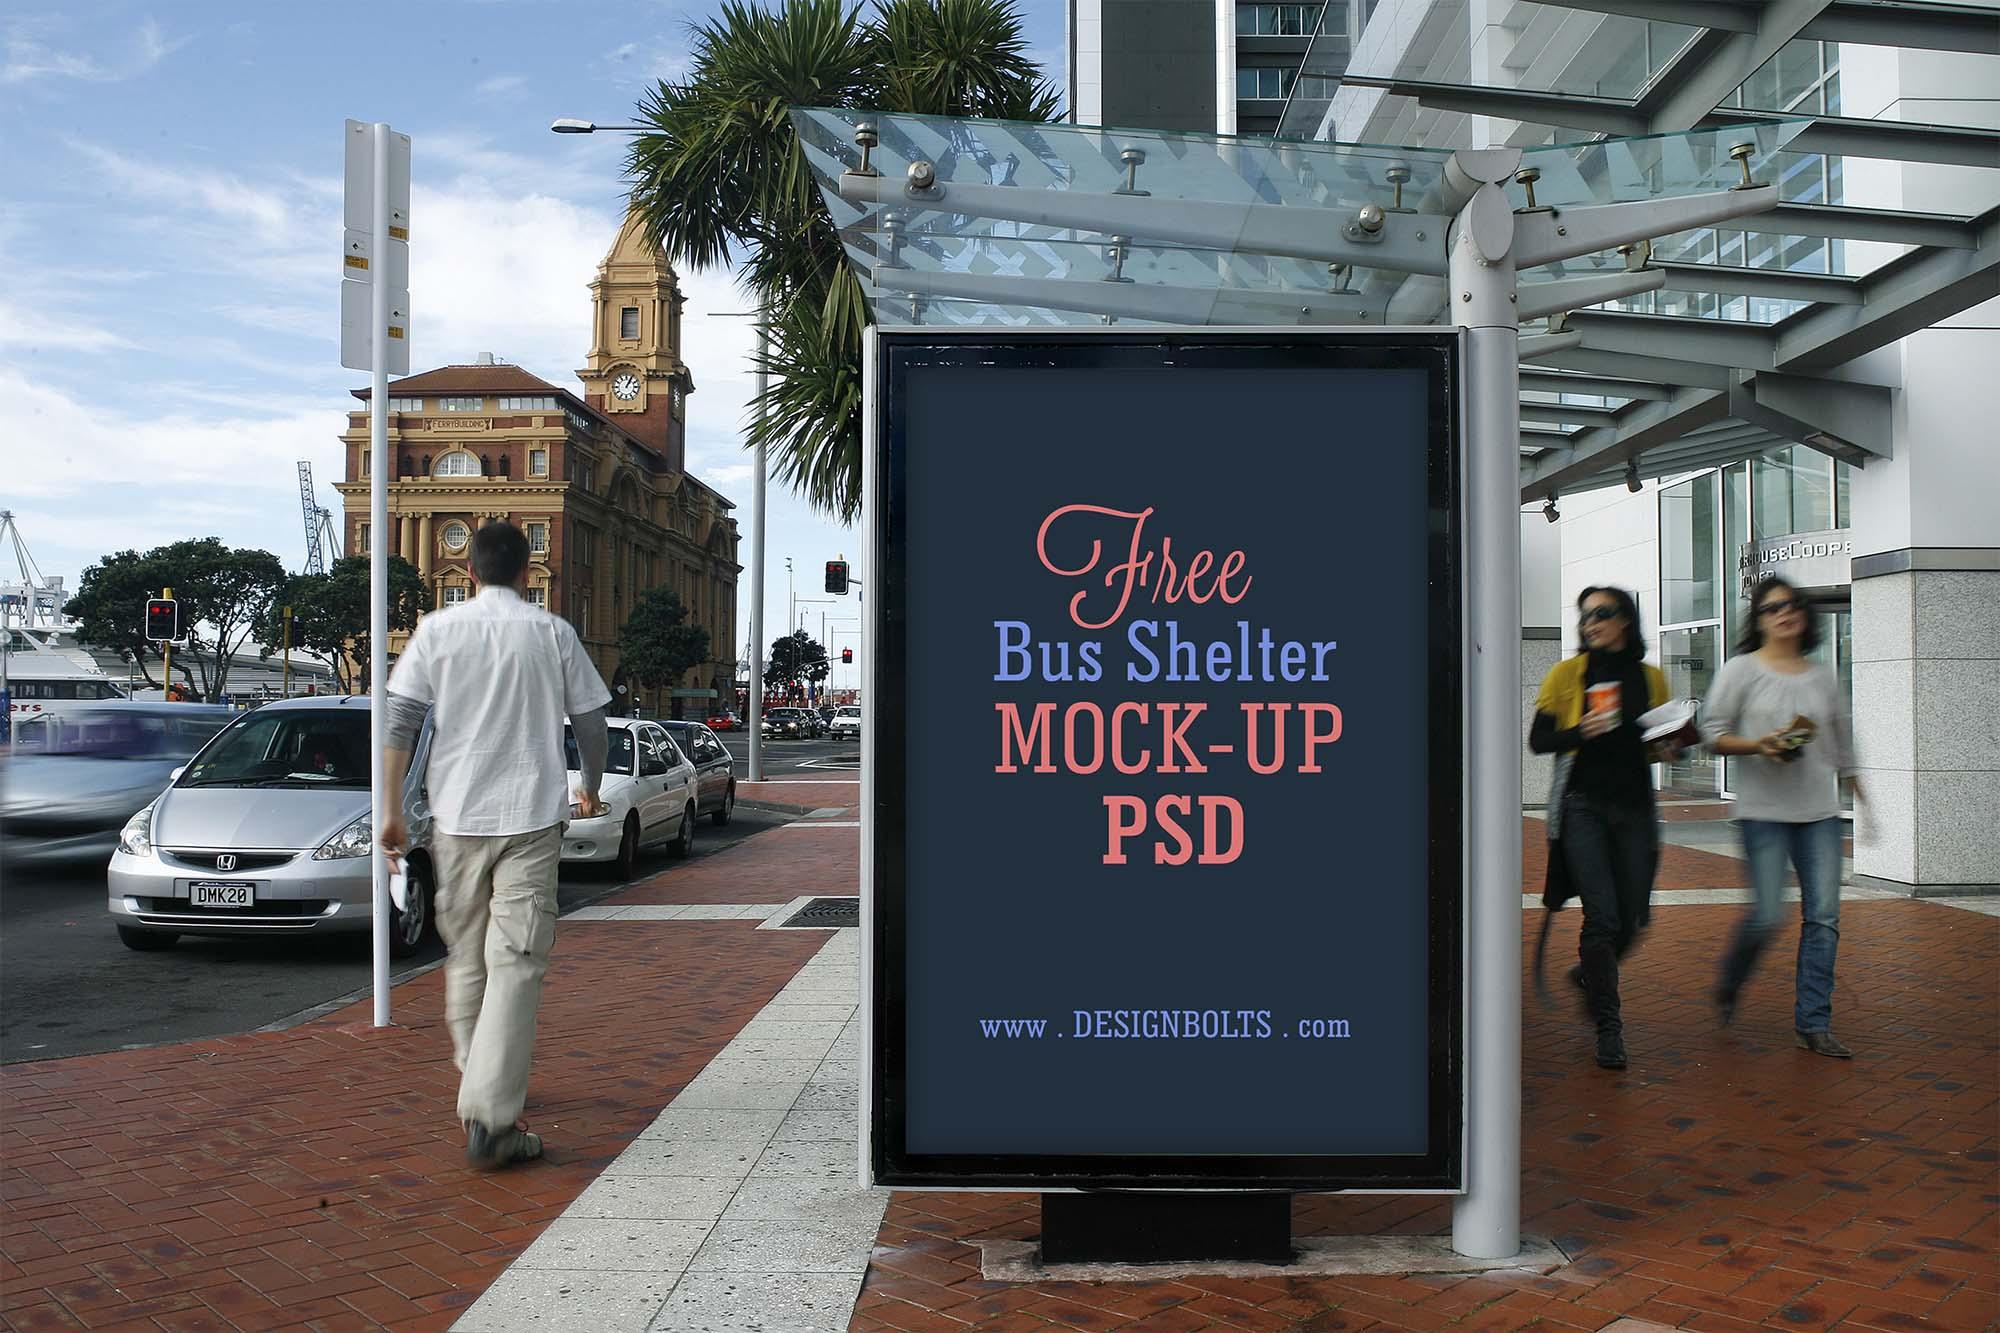 Bus Shelter Advertising Mockup